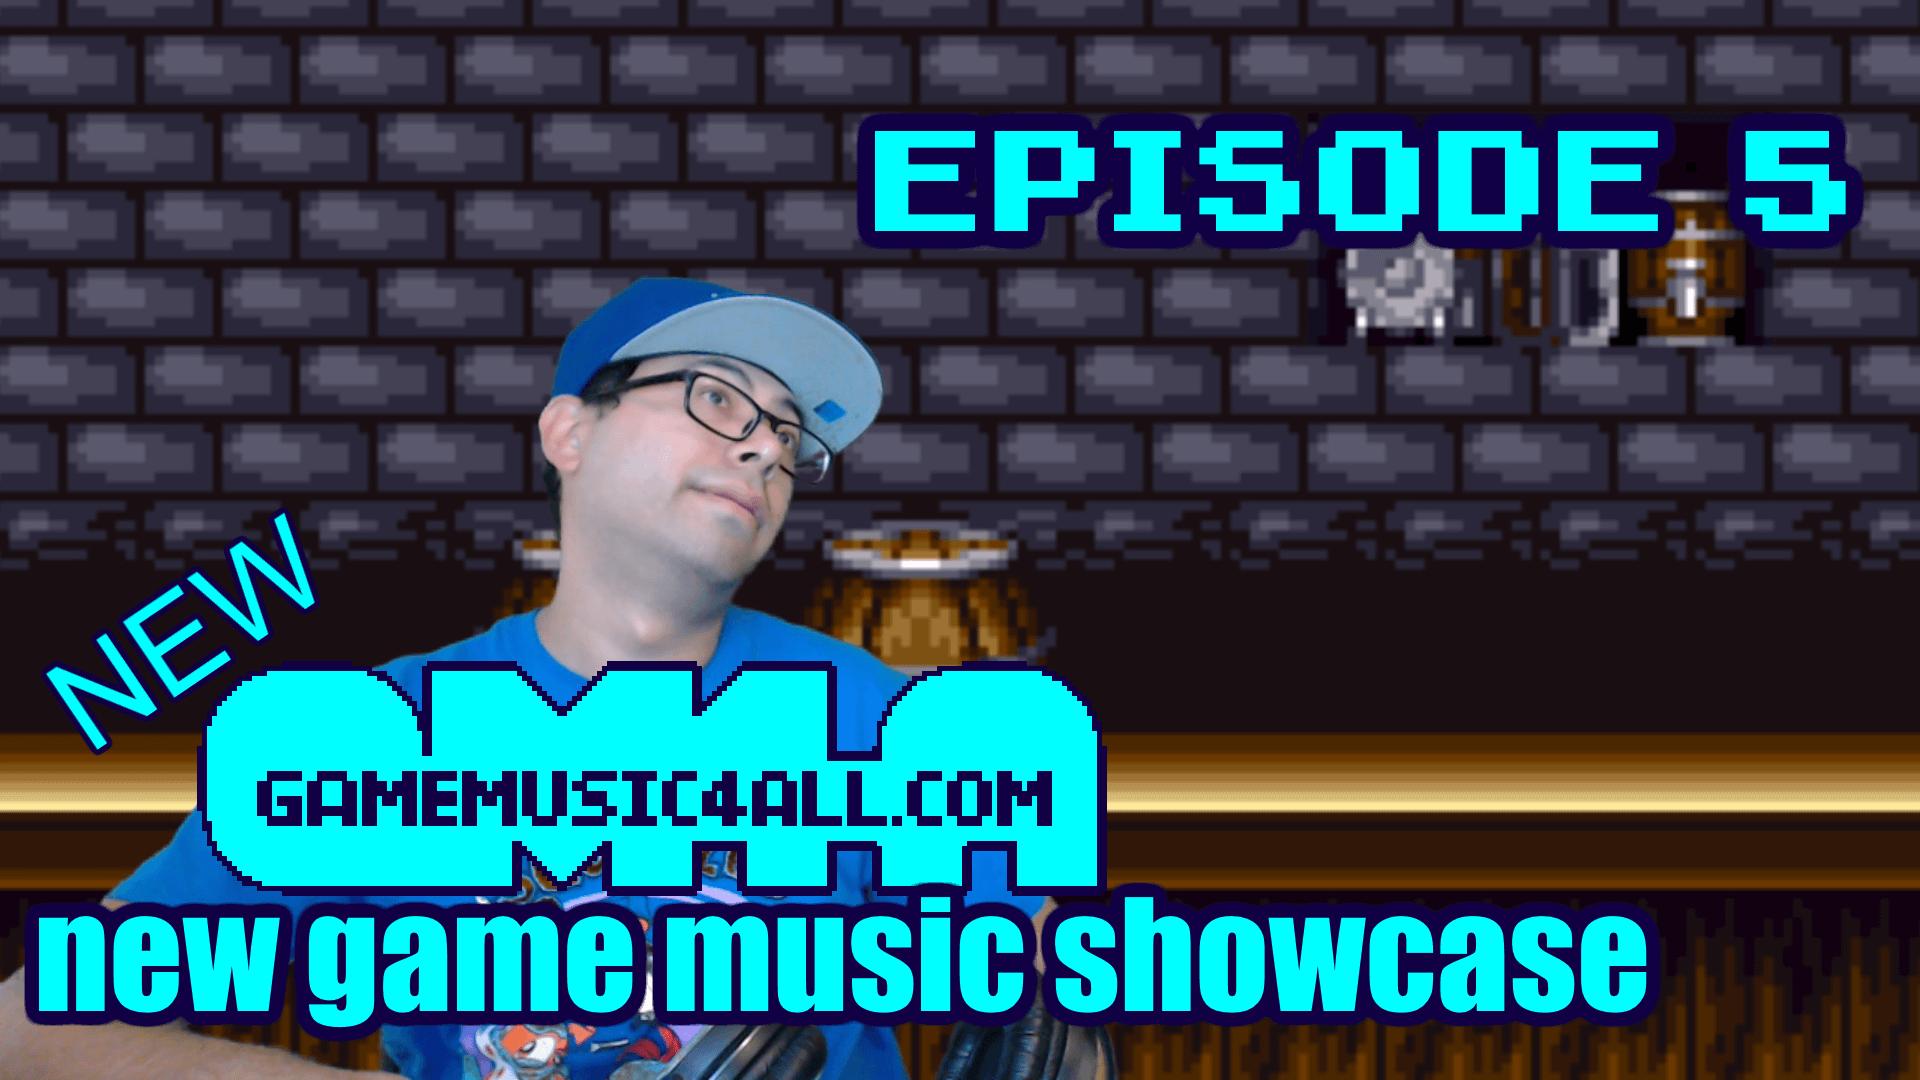 newgamemusicshowcase05.png